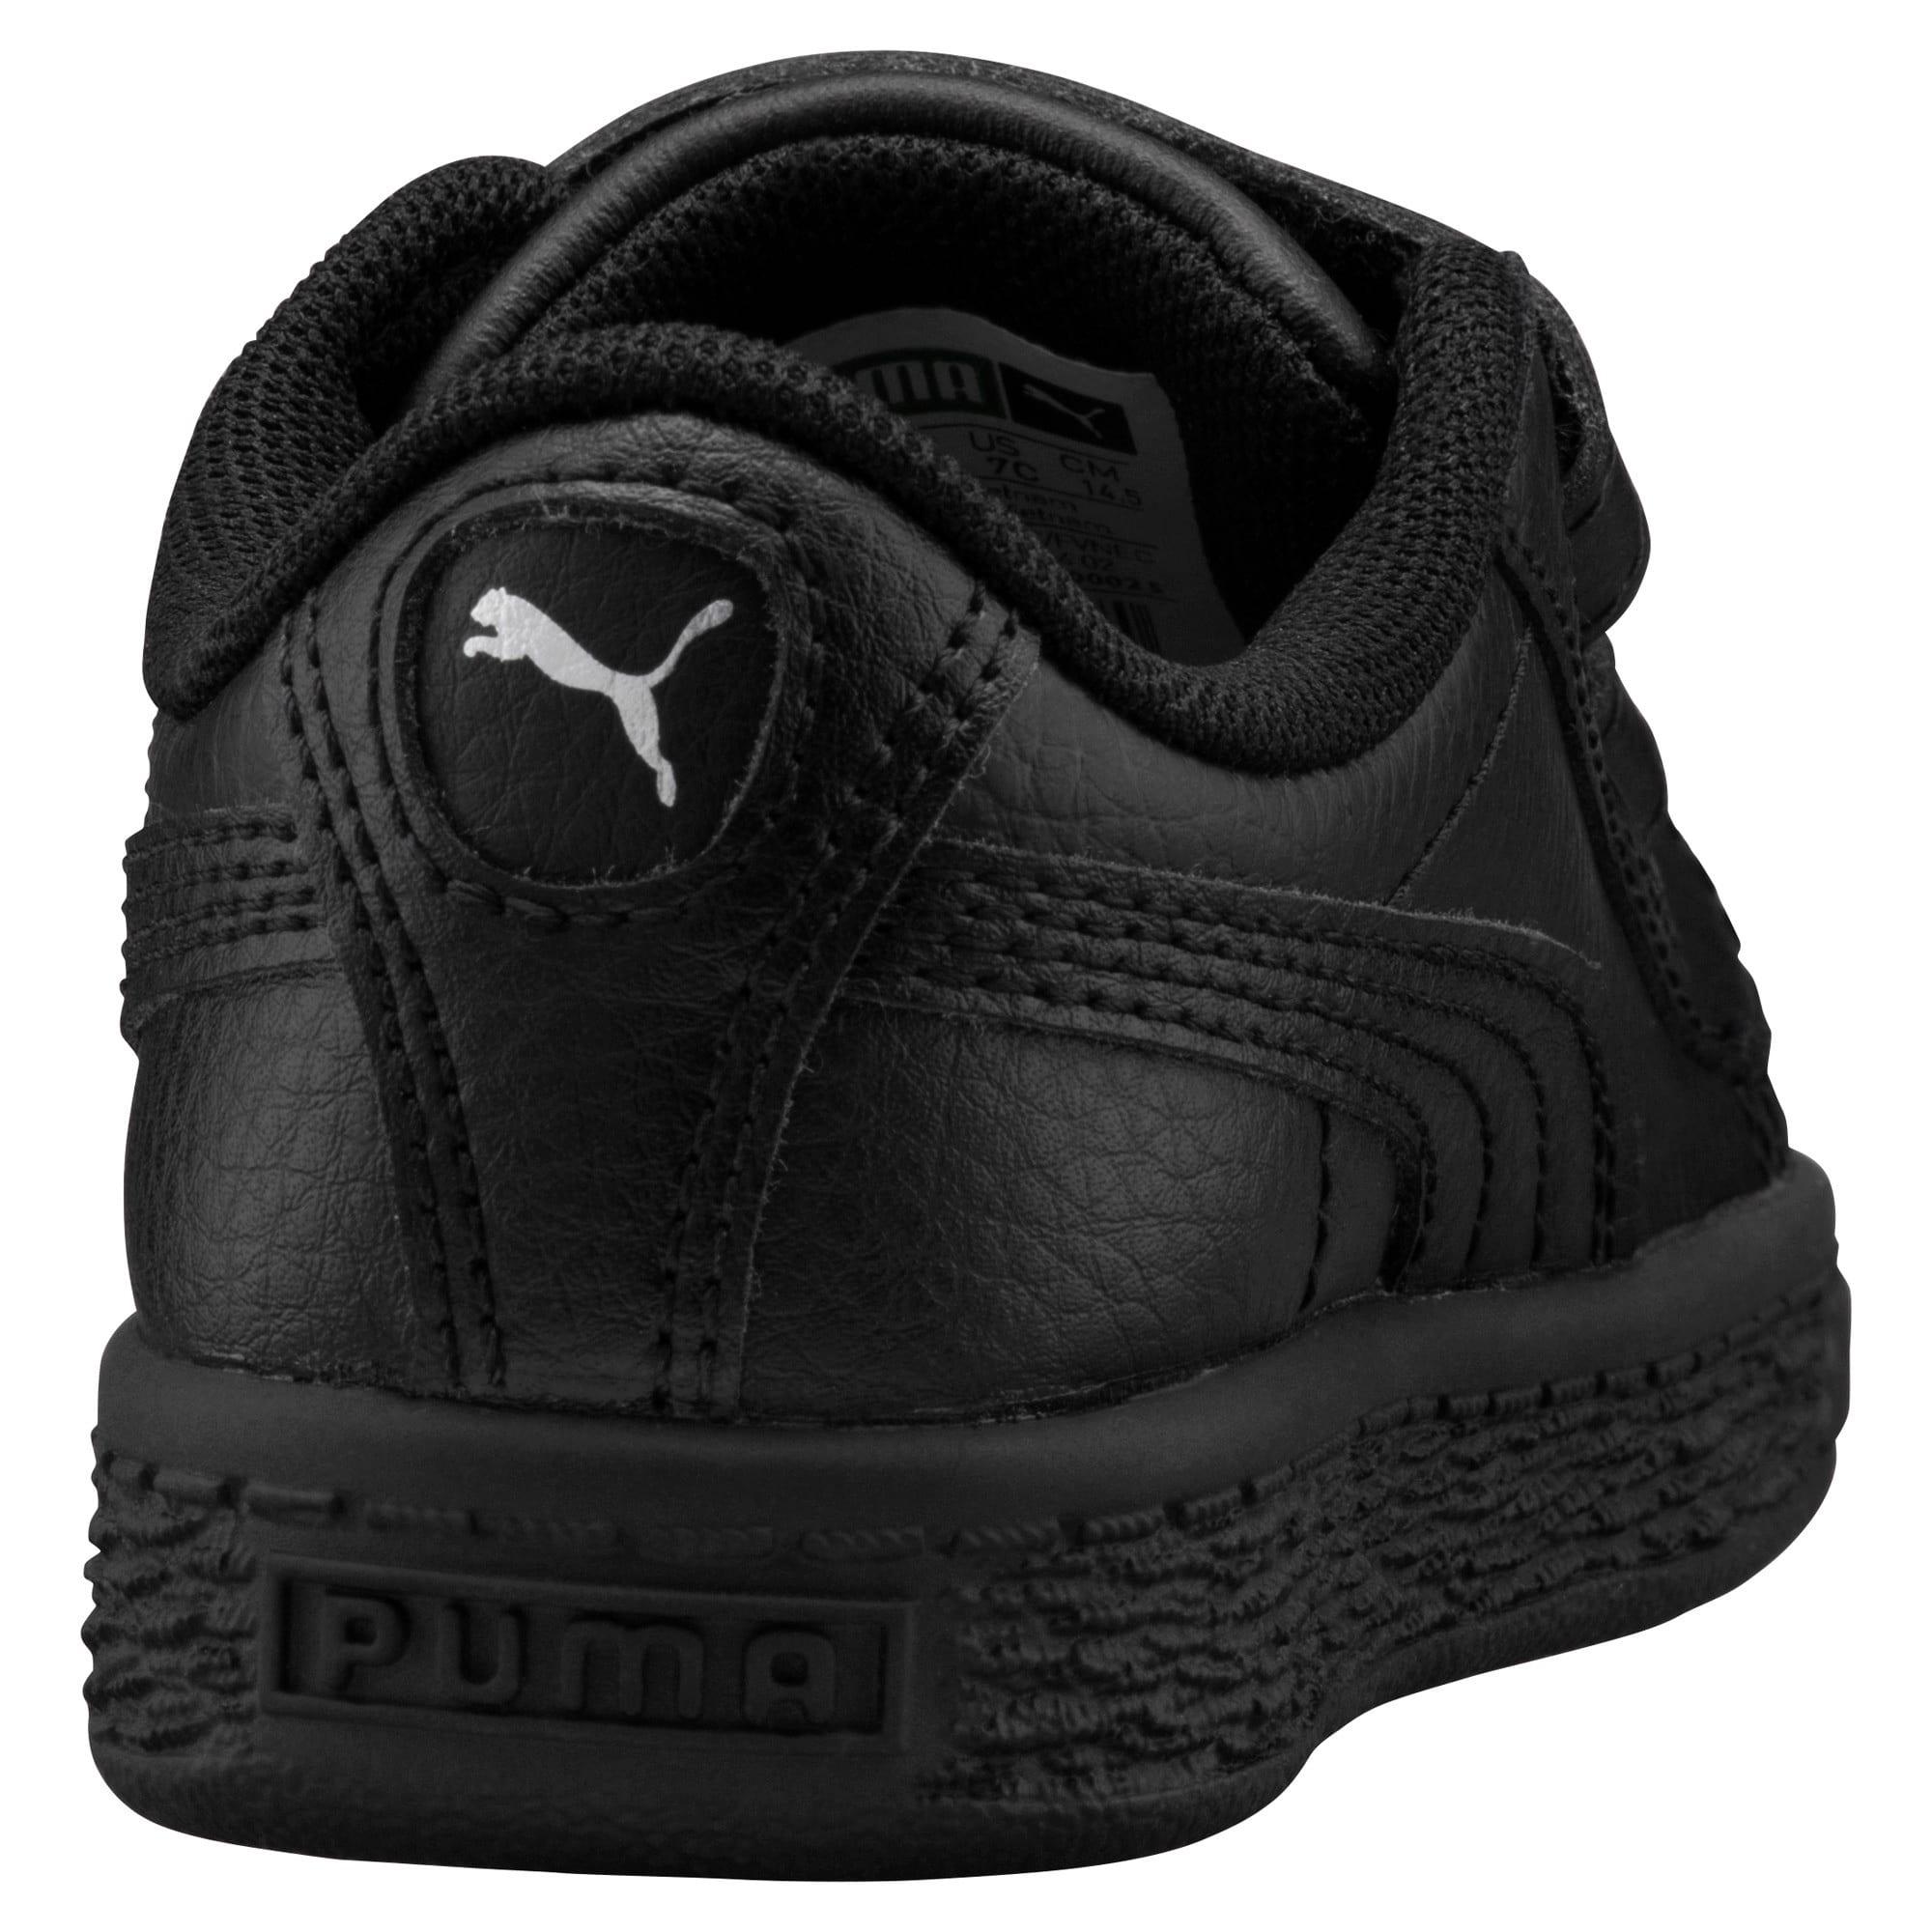 Thumbnail 4 of Basket Classic AC Toddler Shoes, Puma Black-Puma Black, medium